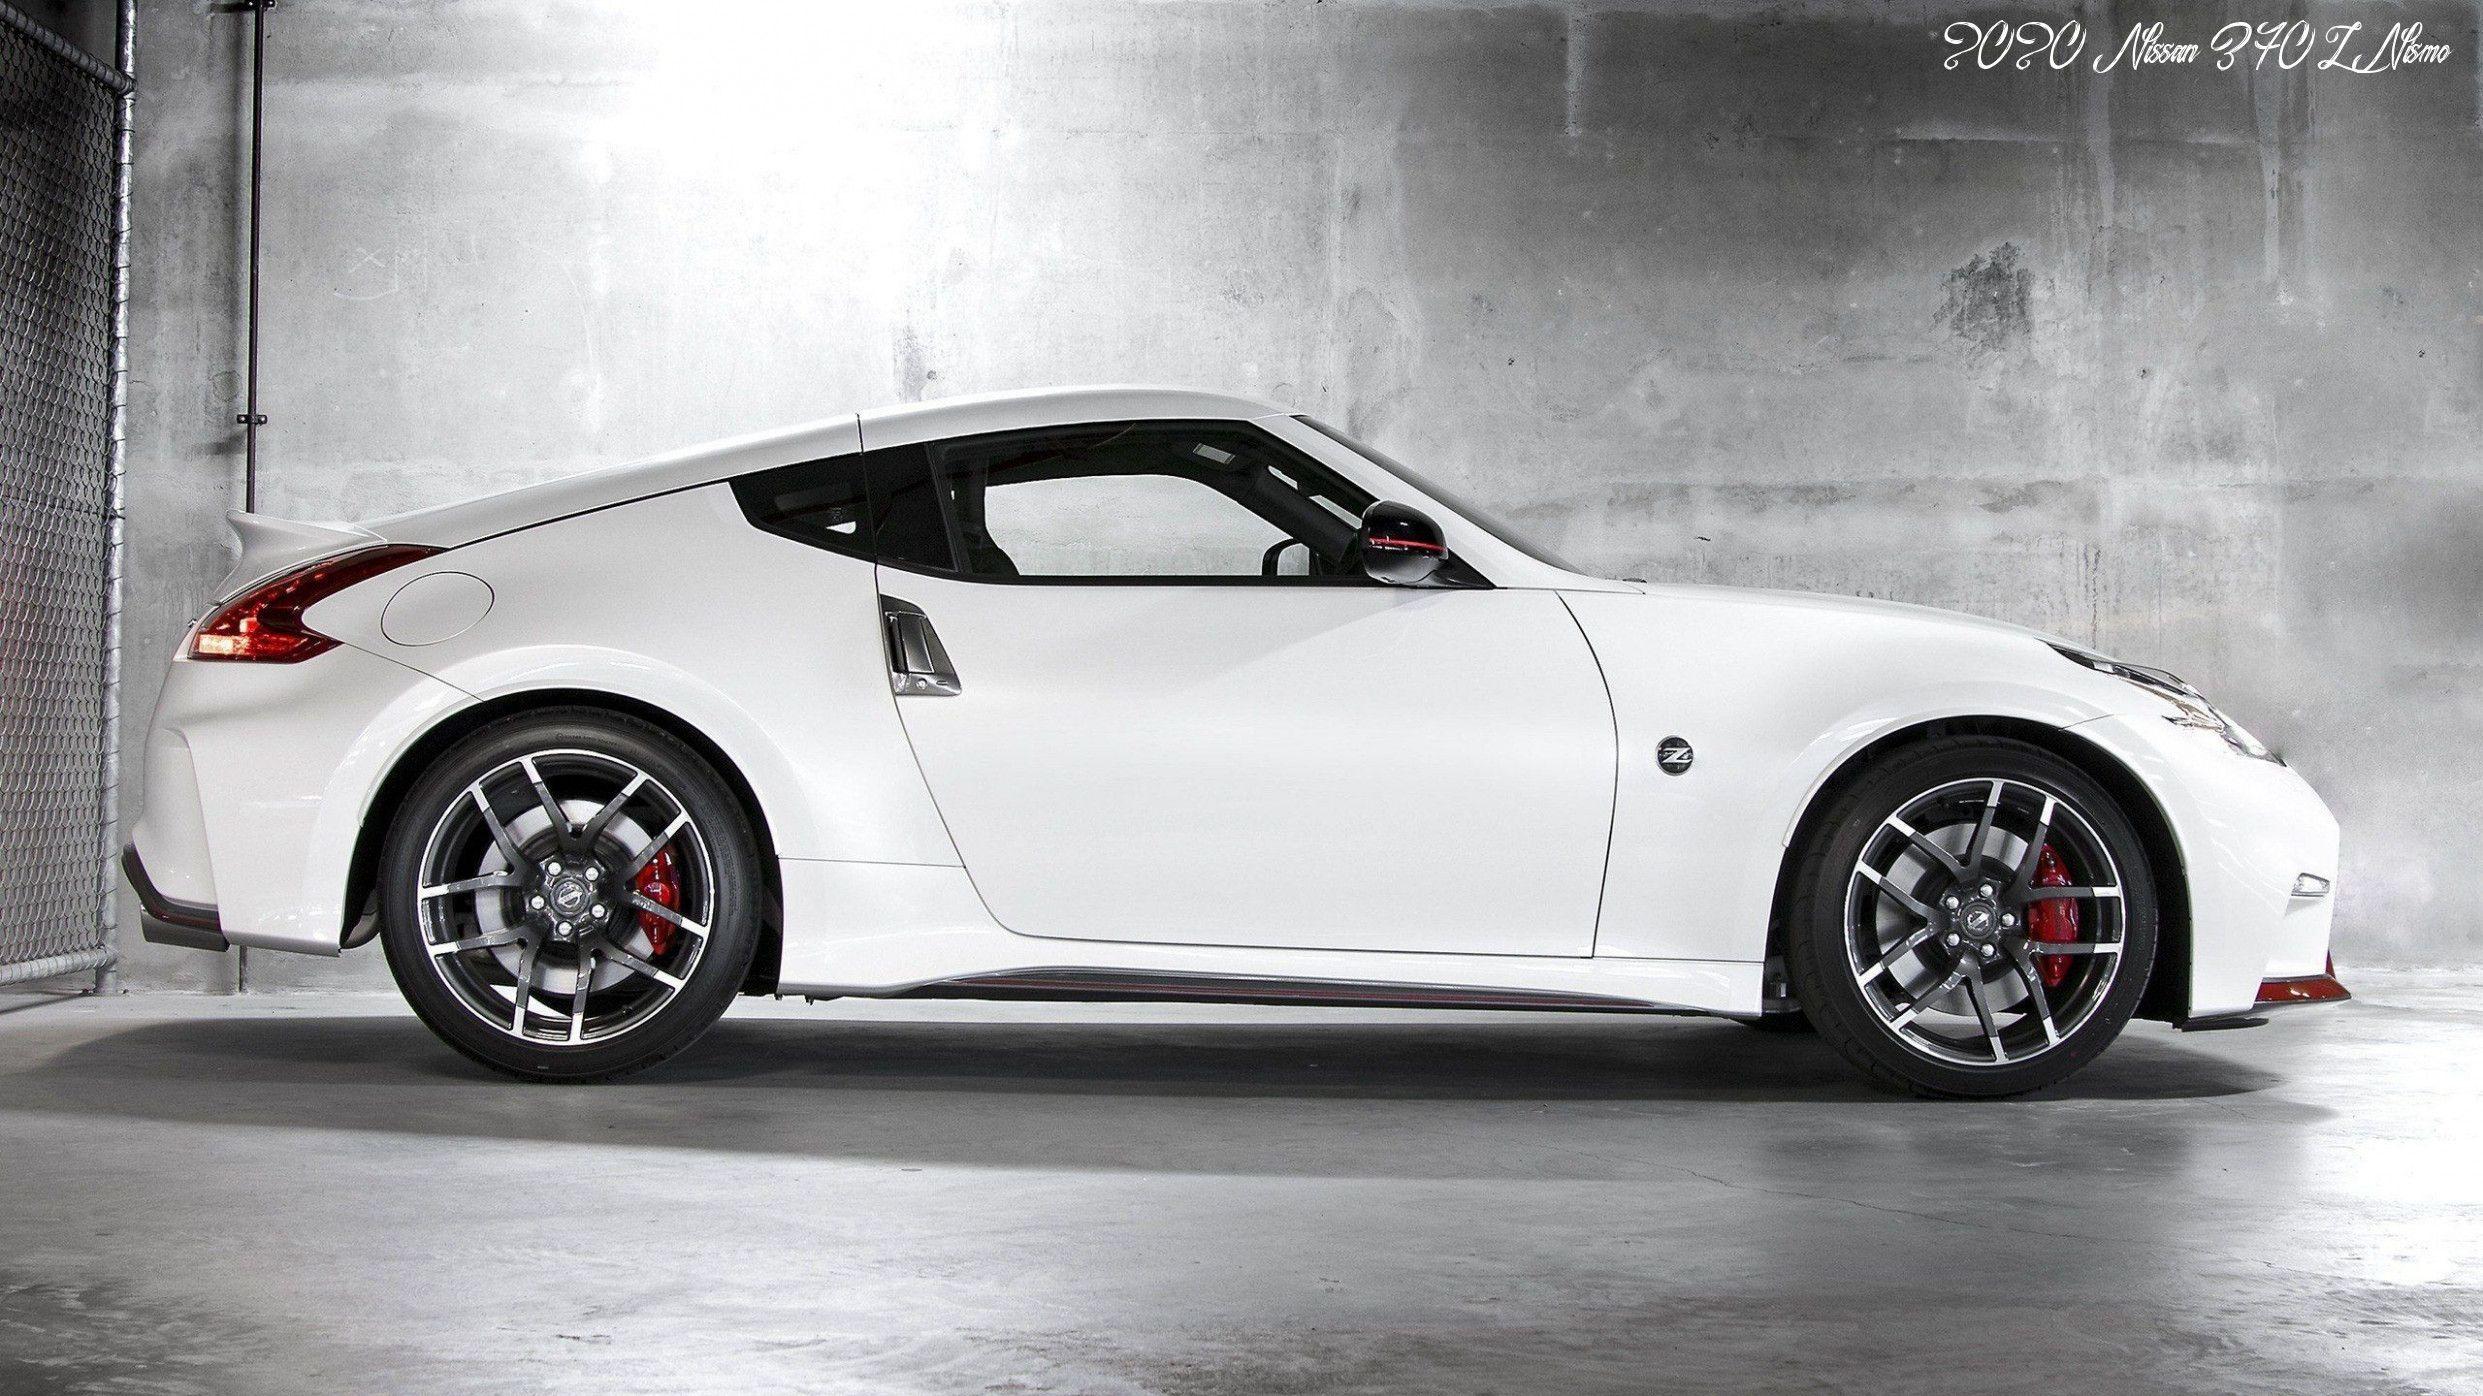 2020 Nissan Z Turbo Nismo Interior